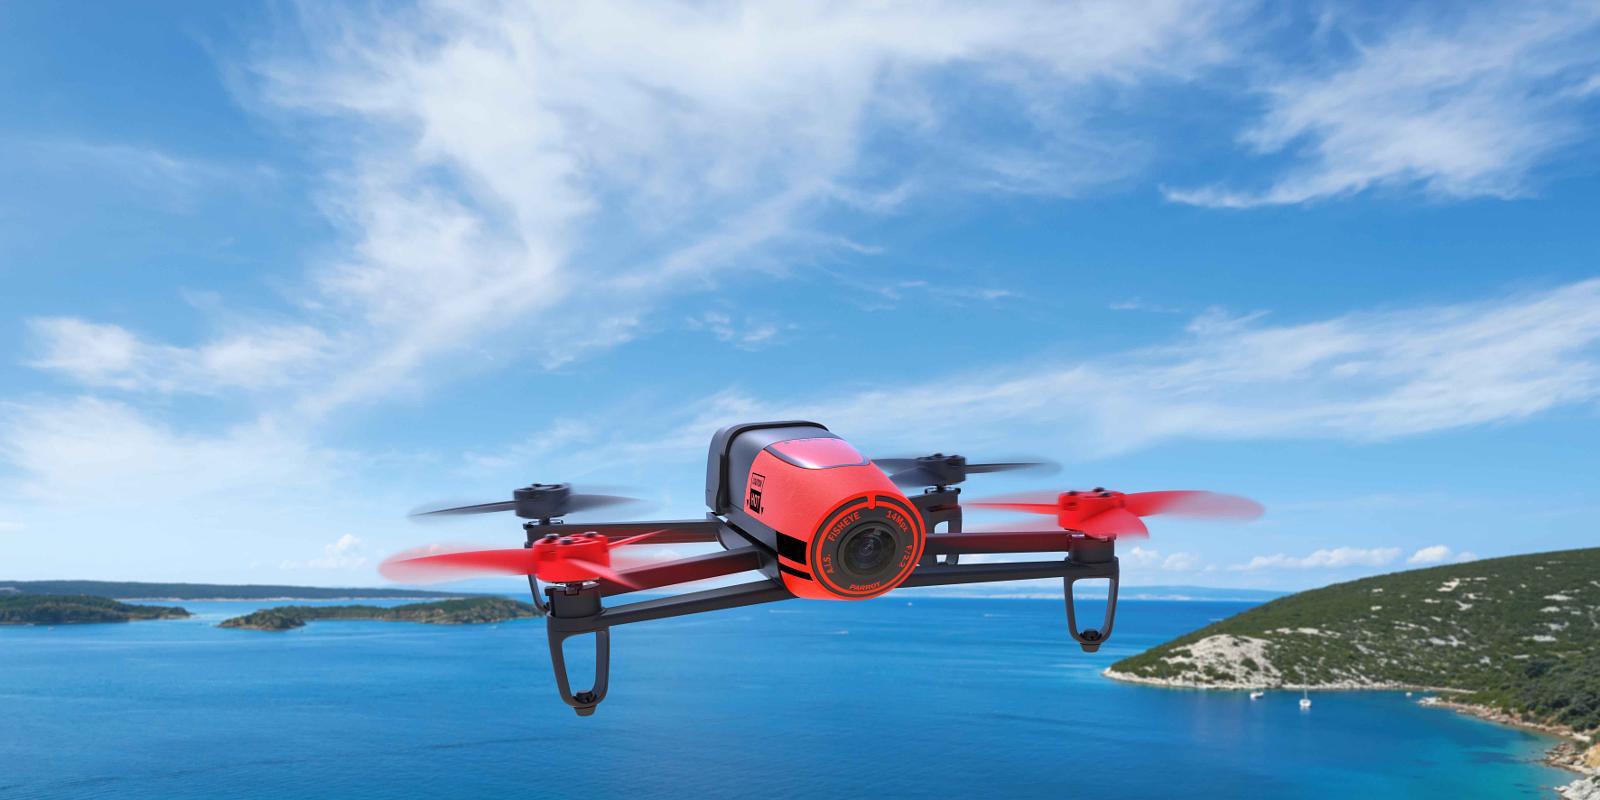 Azur Drones acquires Skeyetech